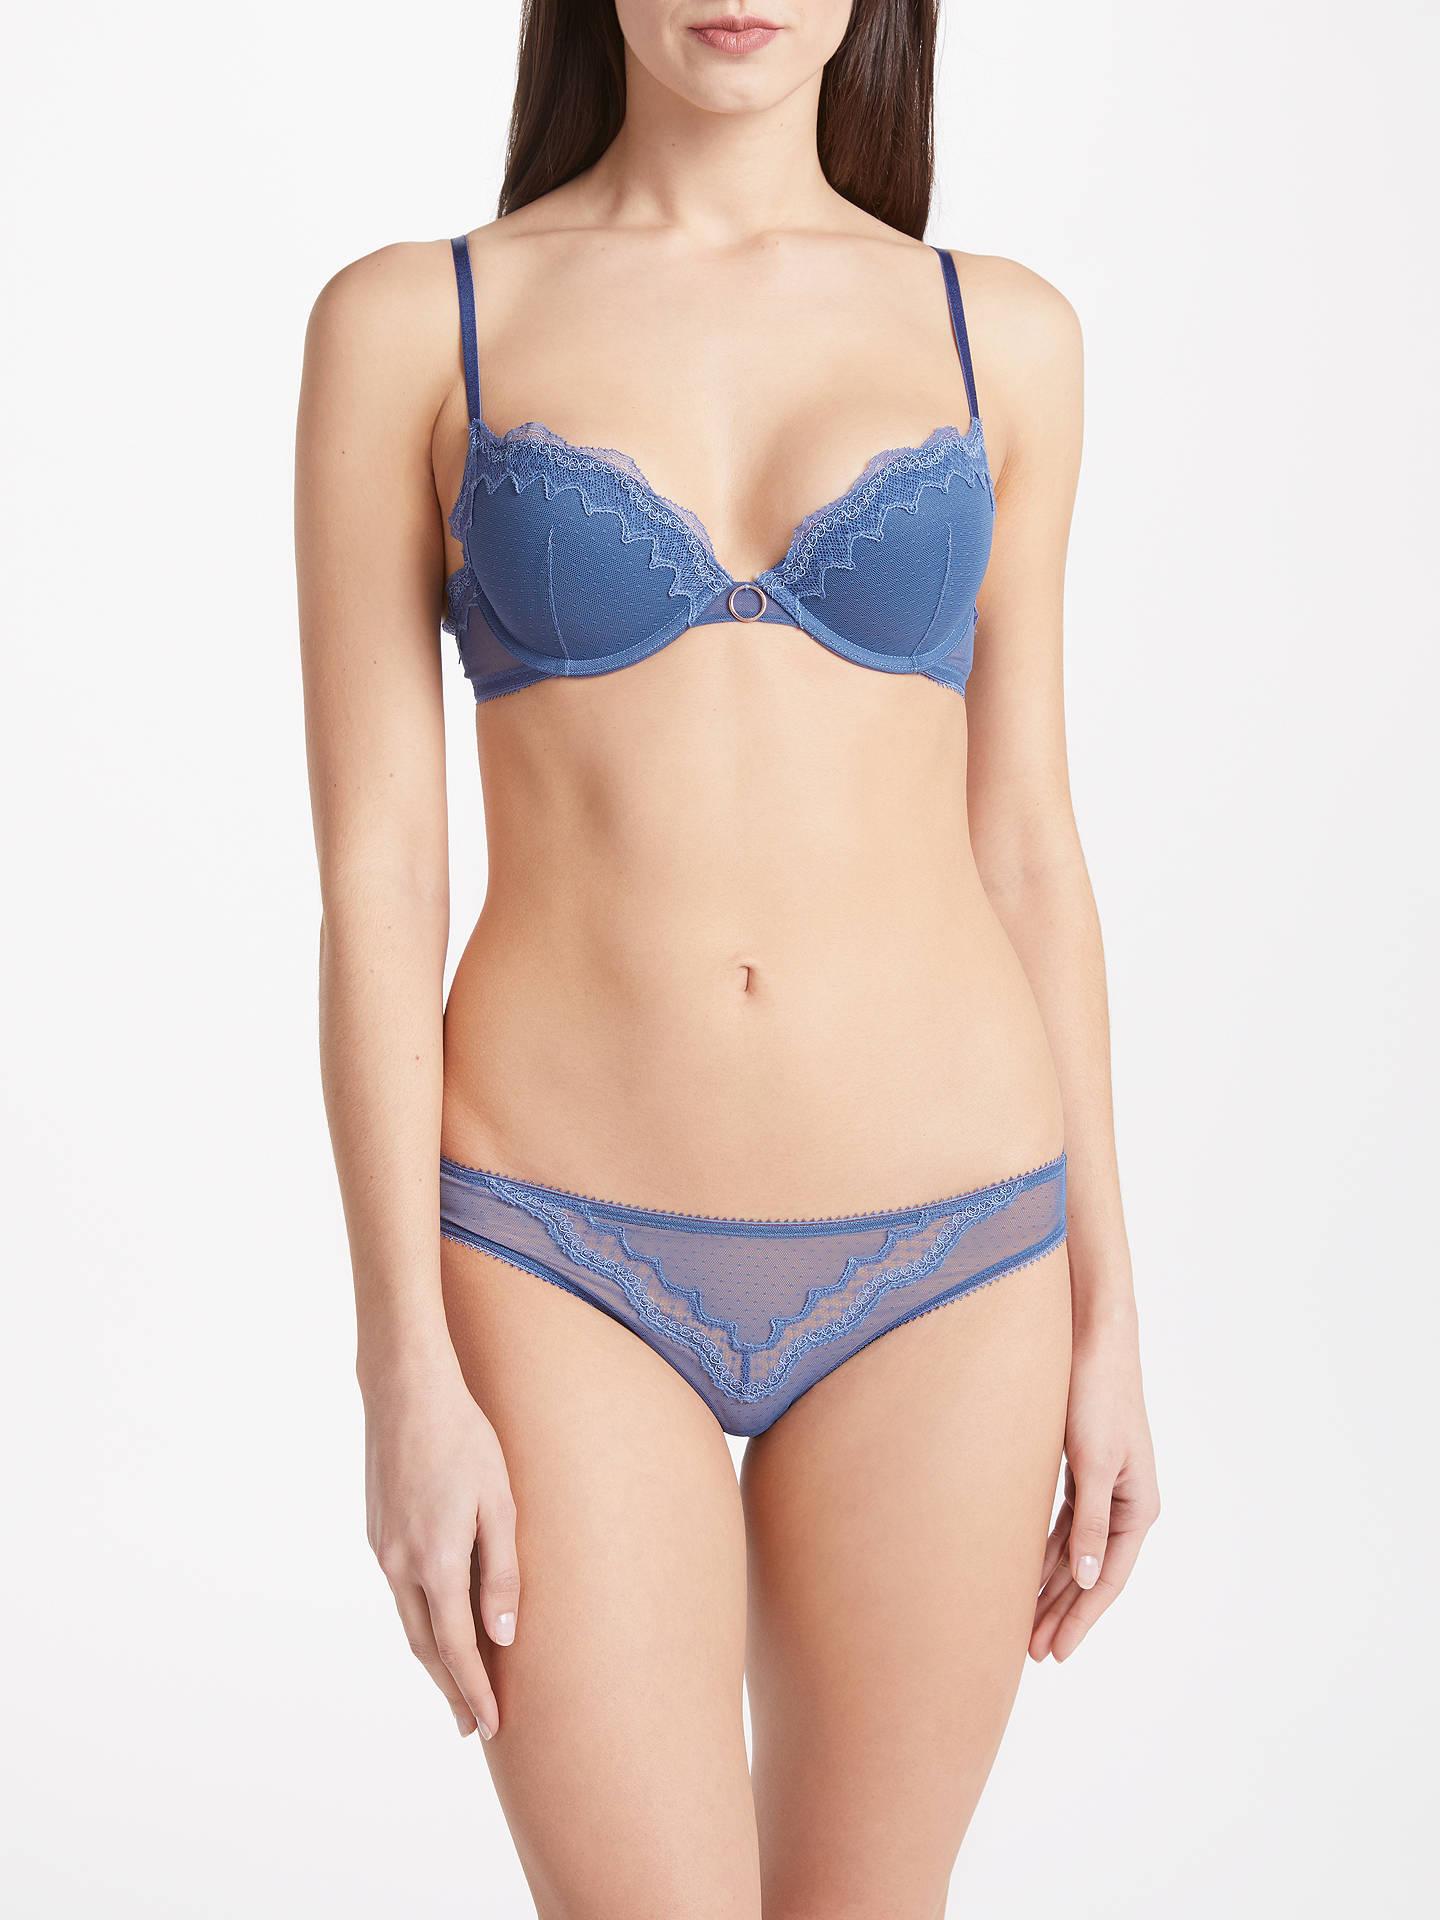 7a498710234 ... Buy Elle Macpherson Body Pure Underwired T-Shirt Bra